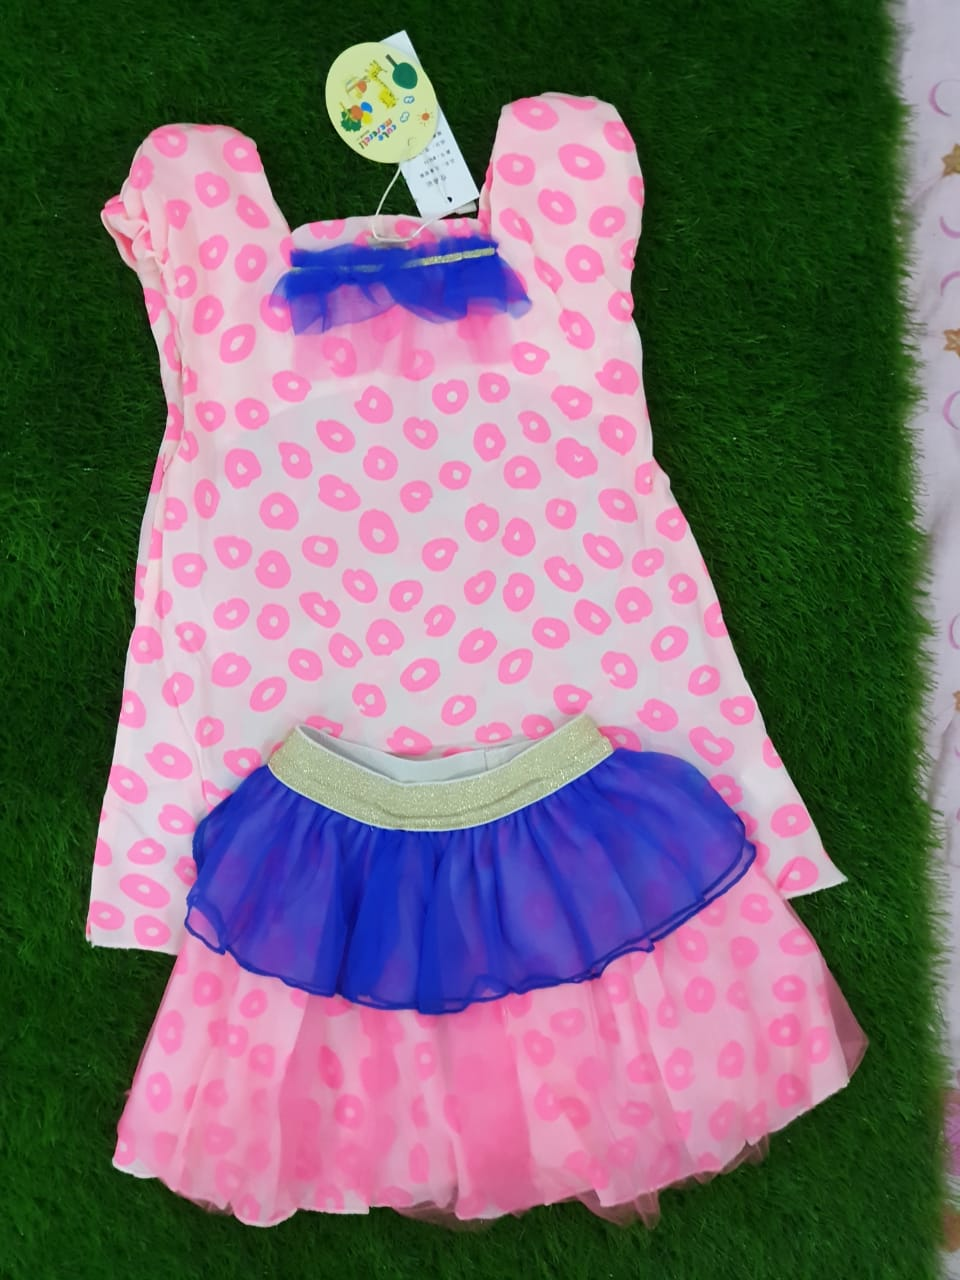 ali kids store, online dresses